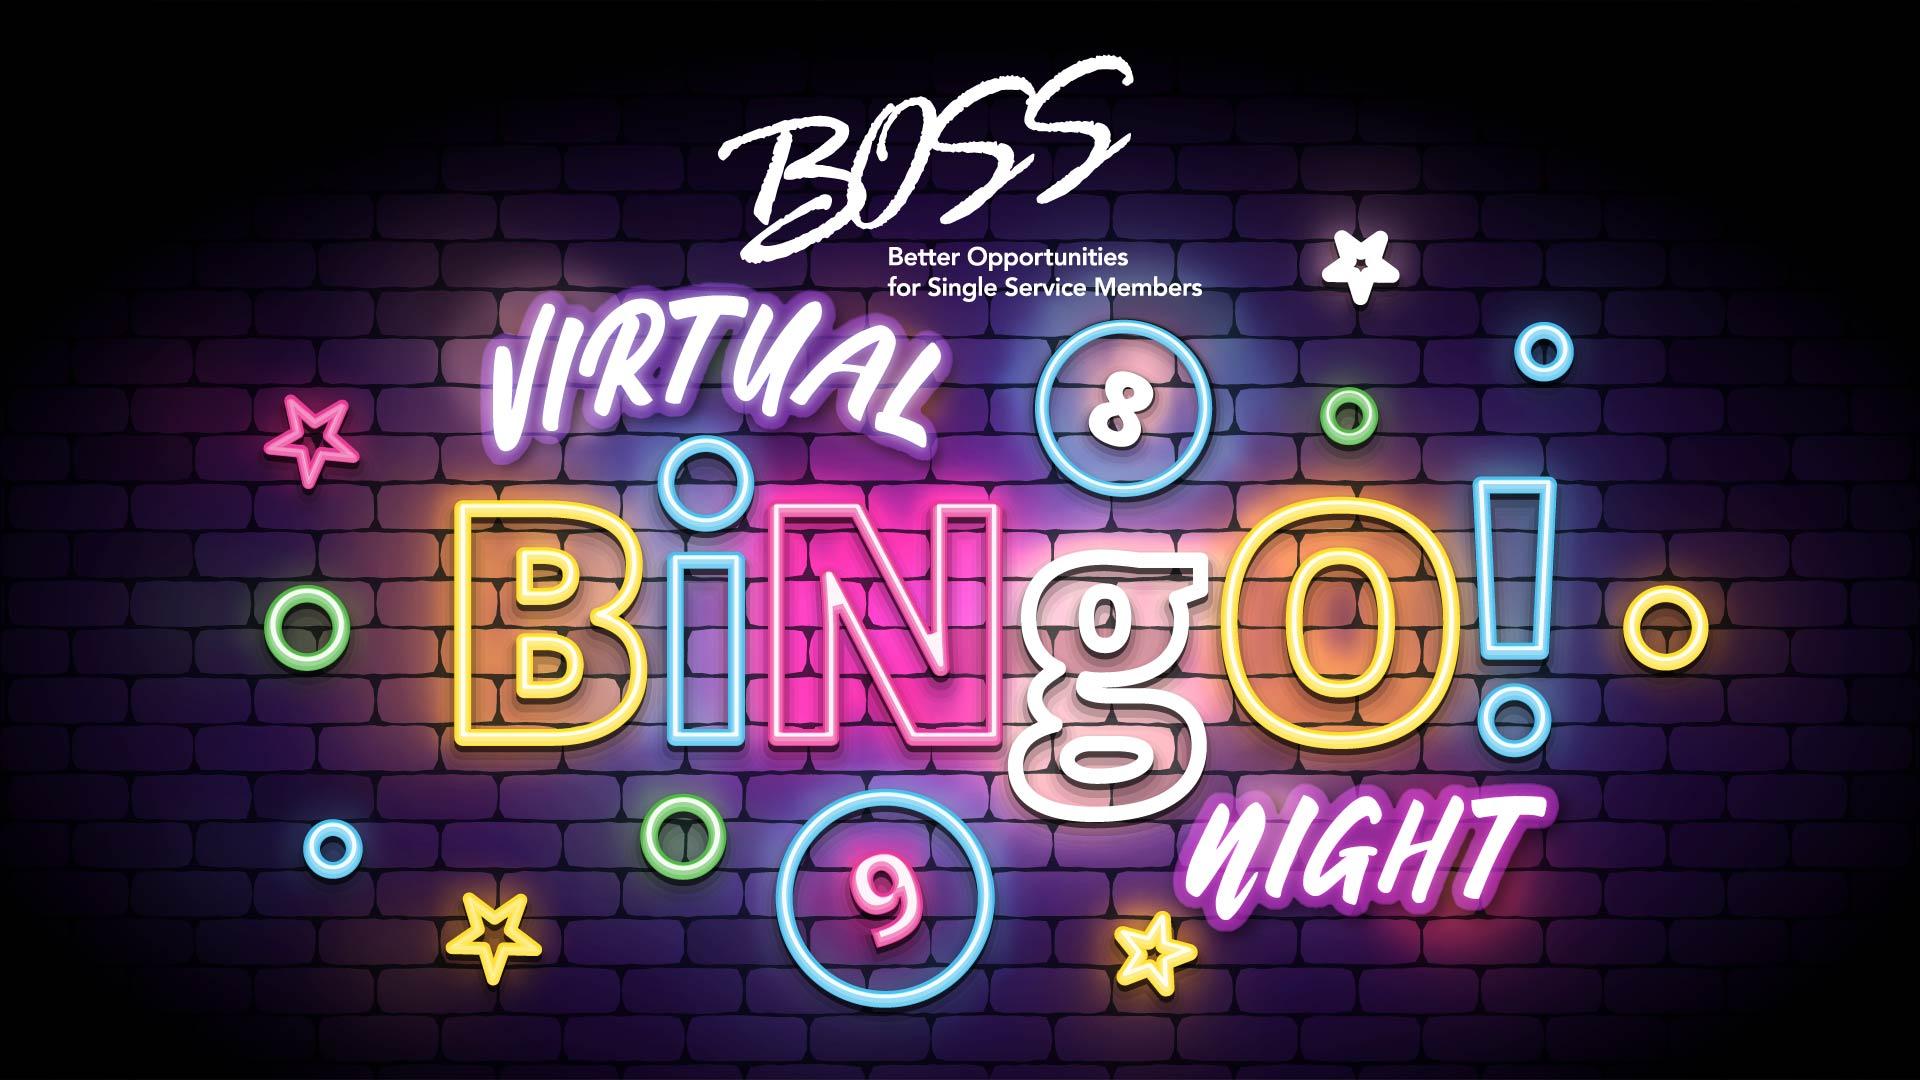 Virtual Bingo with BOSS